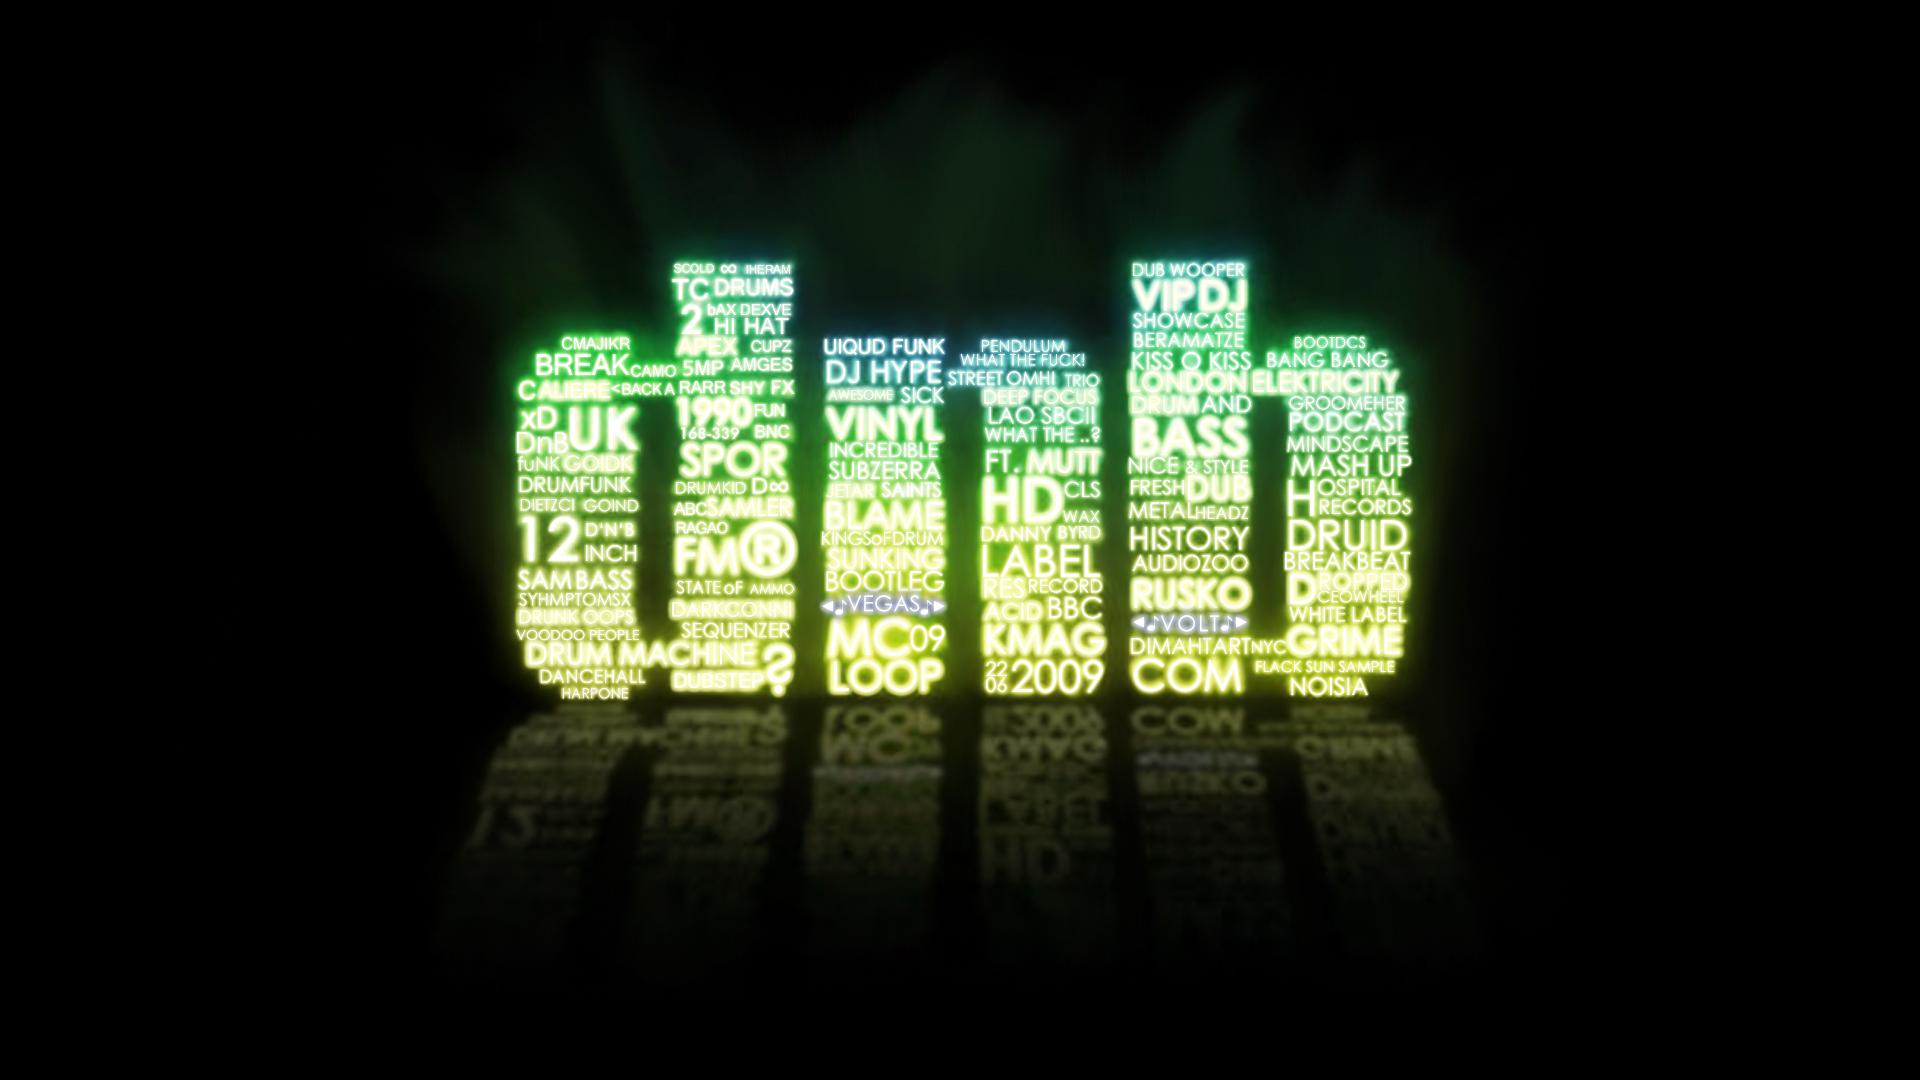 Drum & Bass | Electronic Music Wiki | FANDOM powered by Wikia